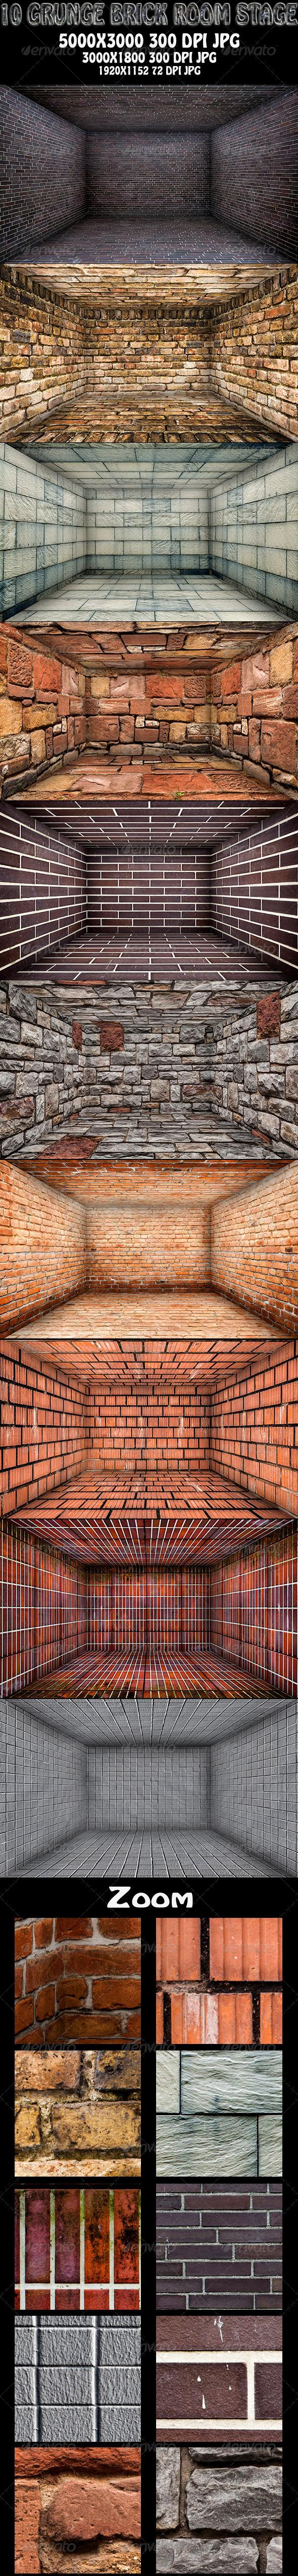 GraphicRiver 10 Grunge Brick Room Stage 6023169